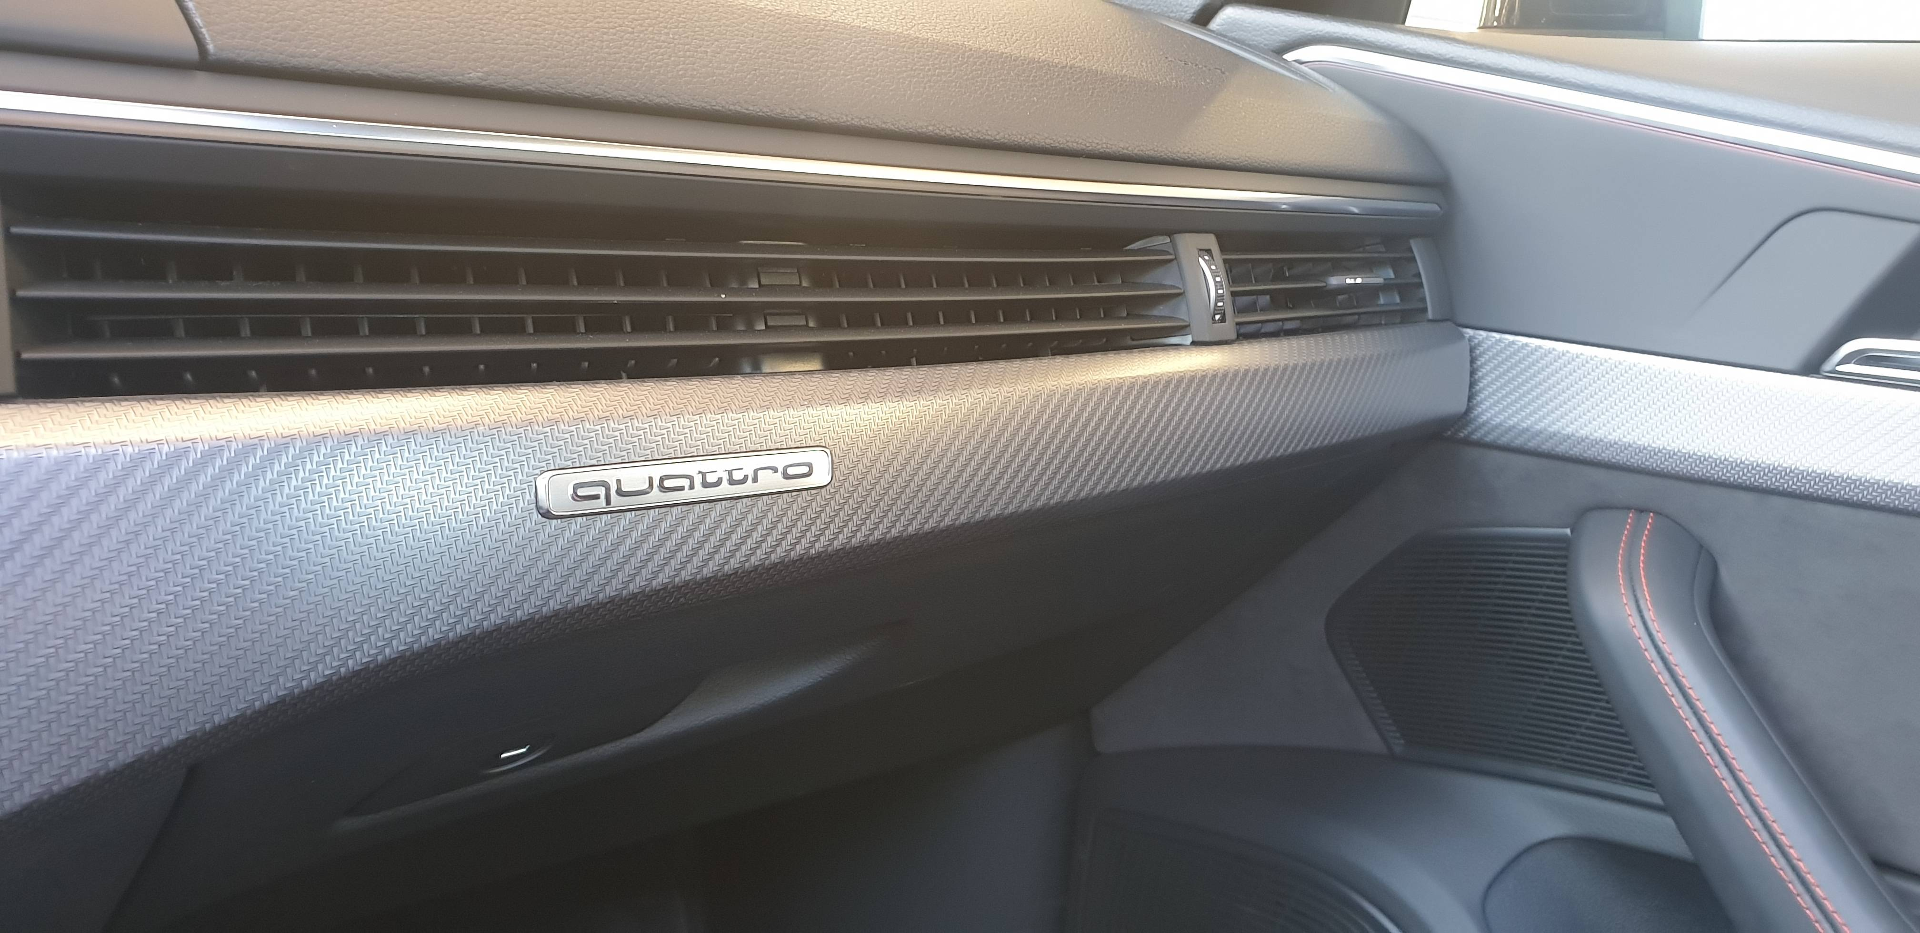 20 - RS4 Avant V6 2.9 TFSI 450 ch Tiptronic 8